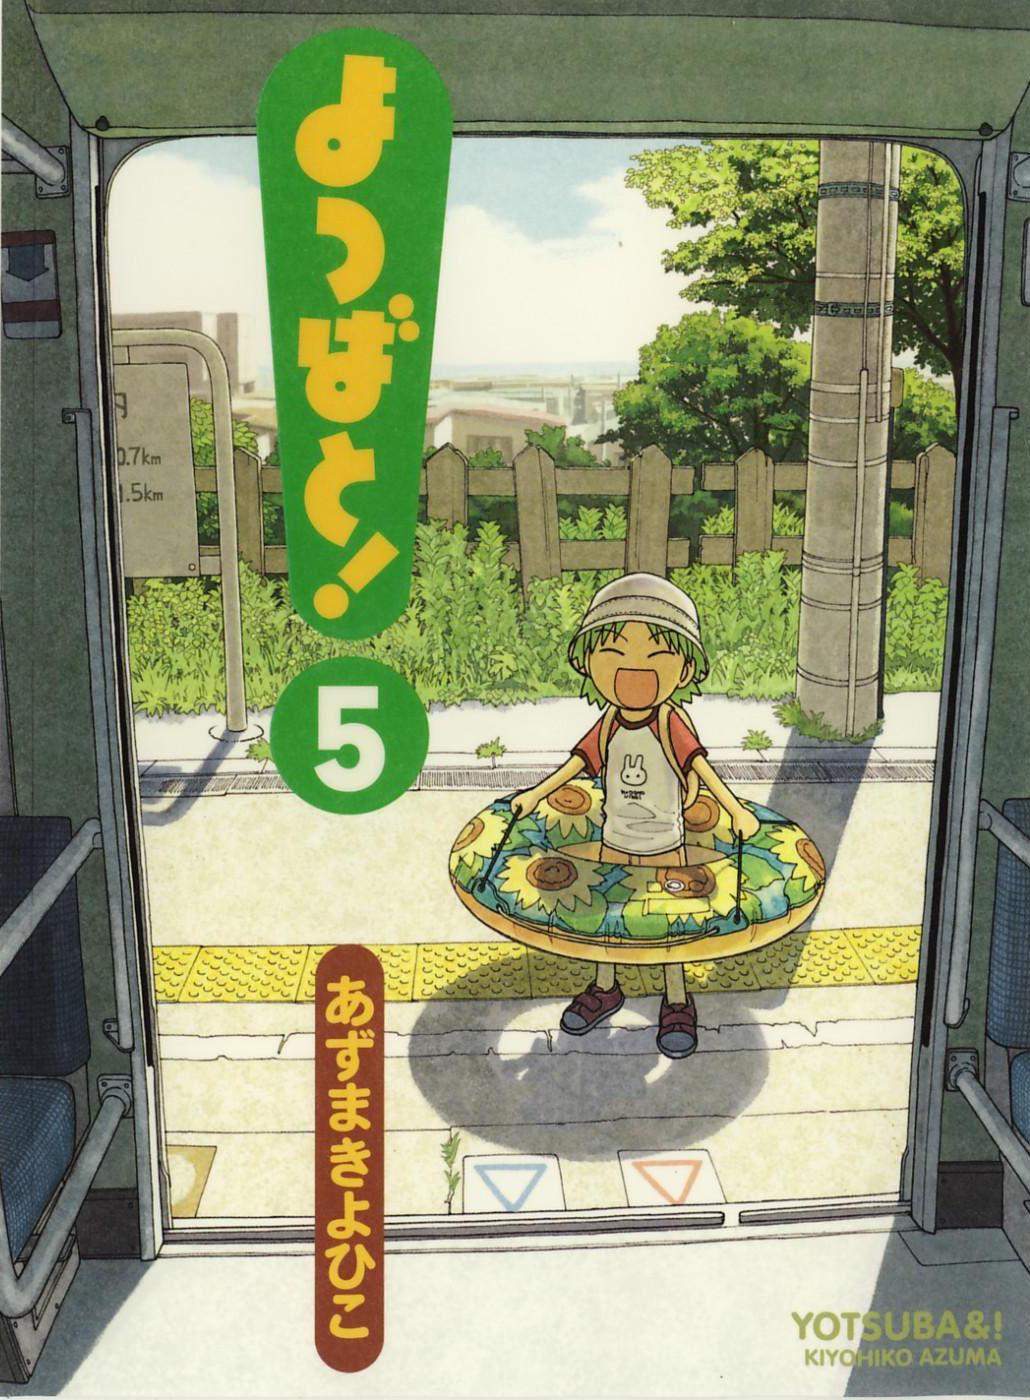 Yotsuba&! Volume 05 | Azumanga Daioh Wiki | FANDOM powered